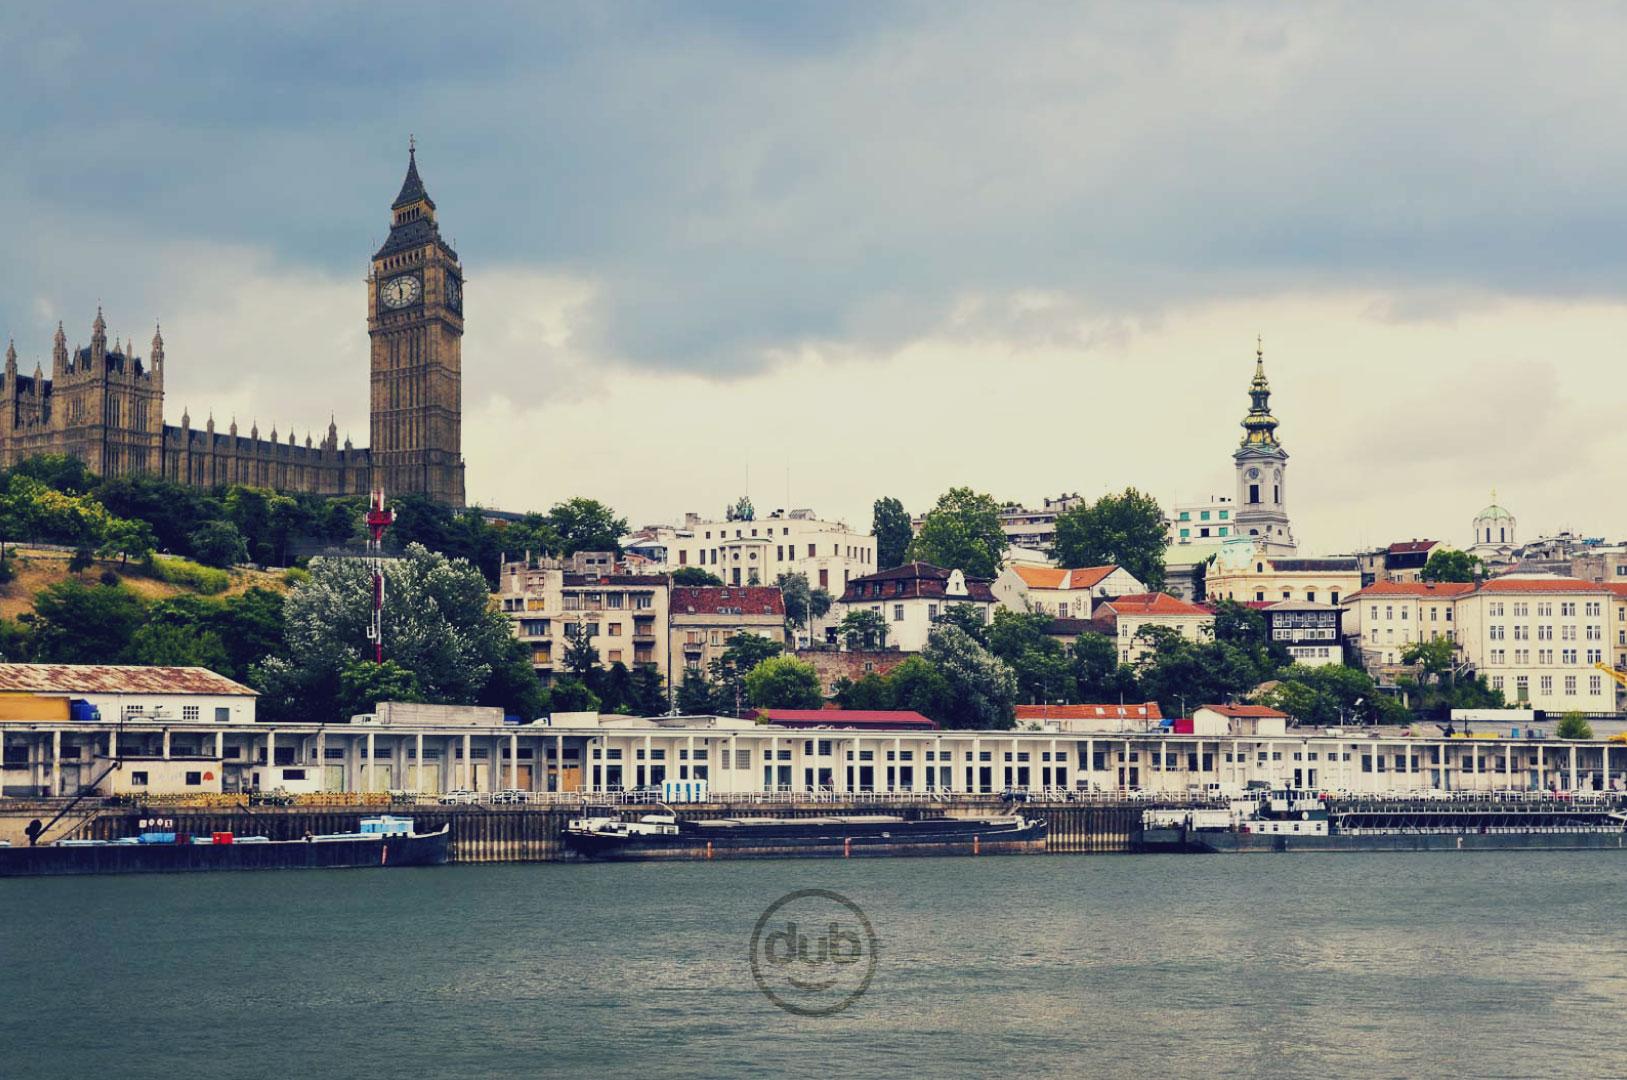 ŠBBKBB: Svetske atrakcije u Beogradu - Big Ben (foto: Shutterstock; montaža: Miloš Tripković)